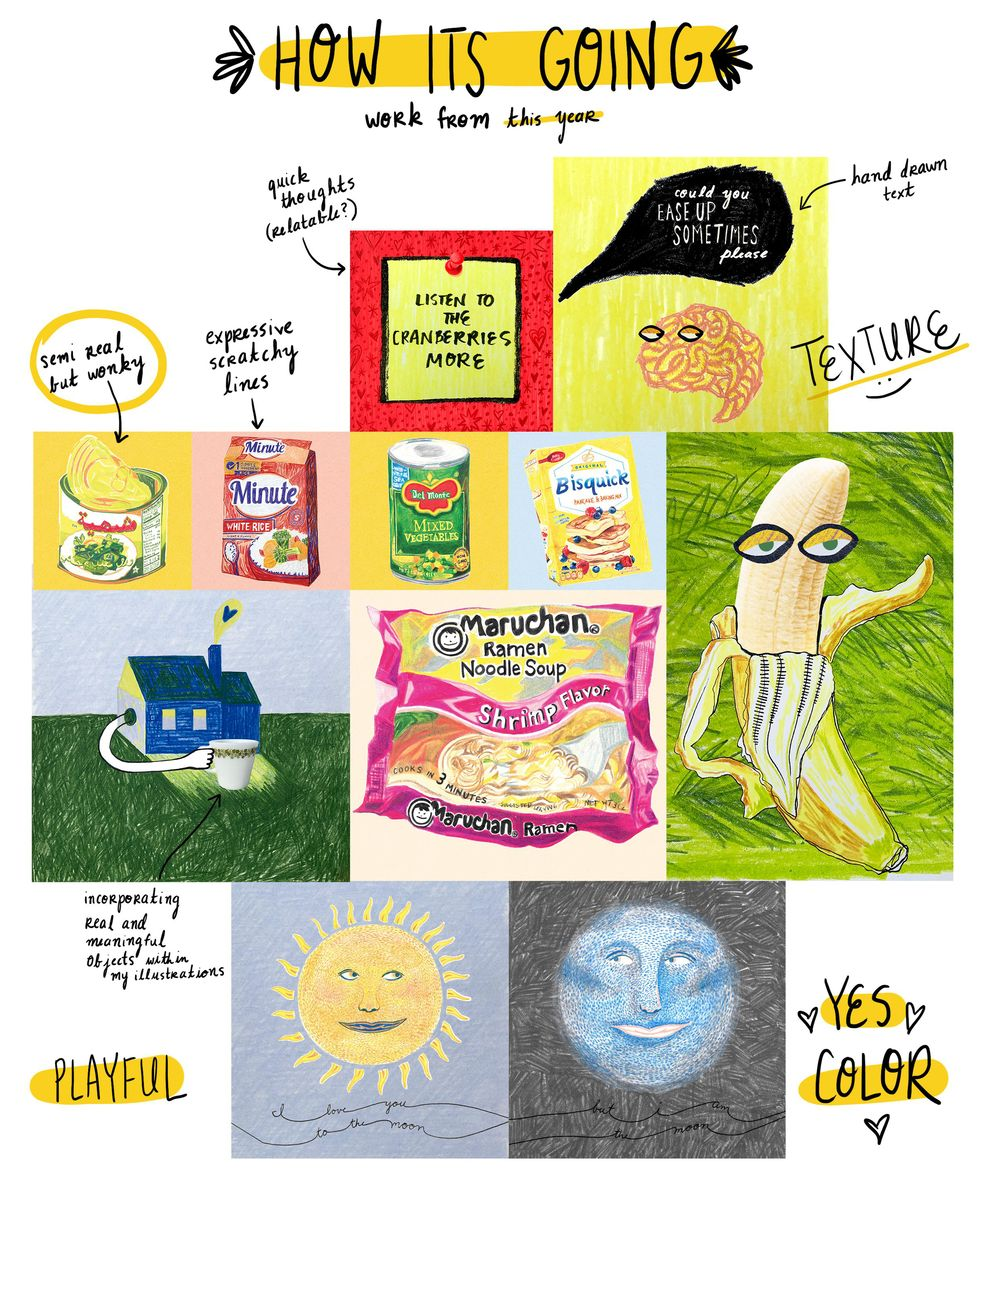 Pilot Illustrations - image 5 - student project